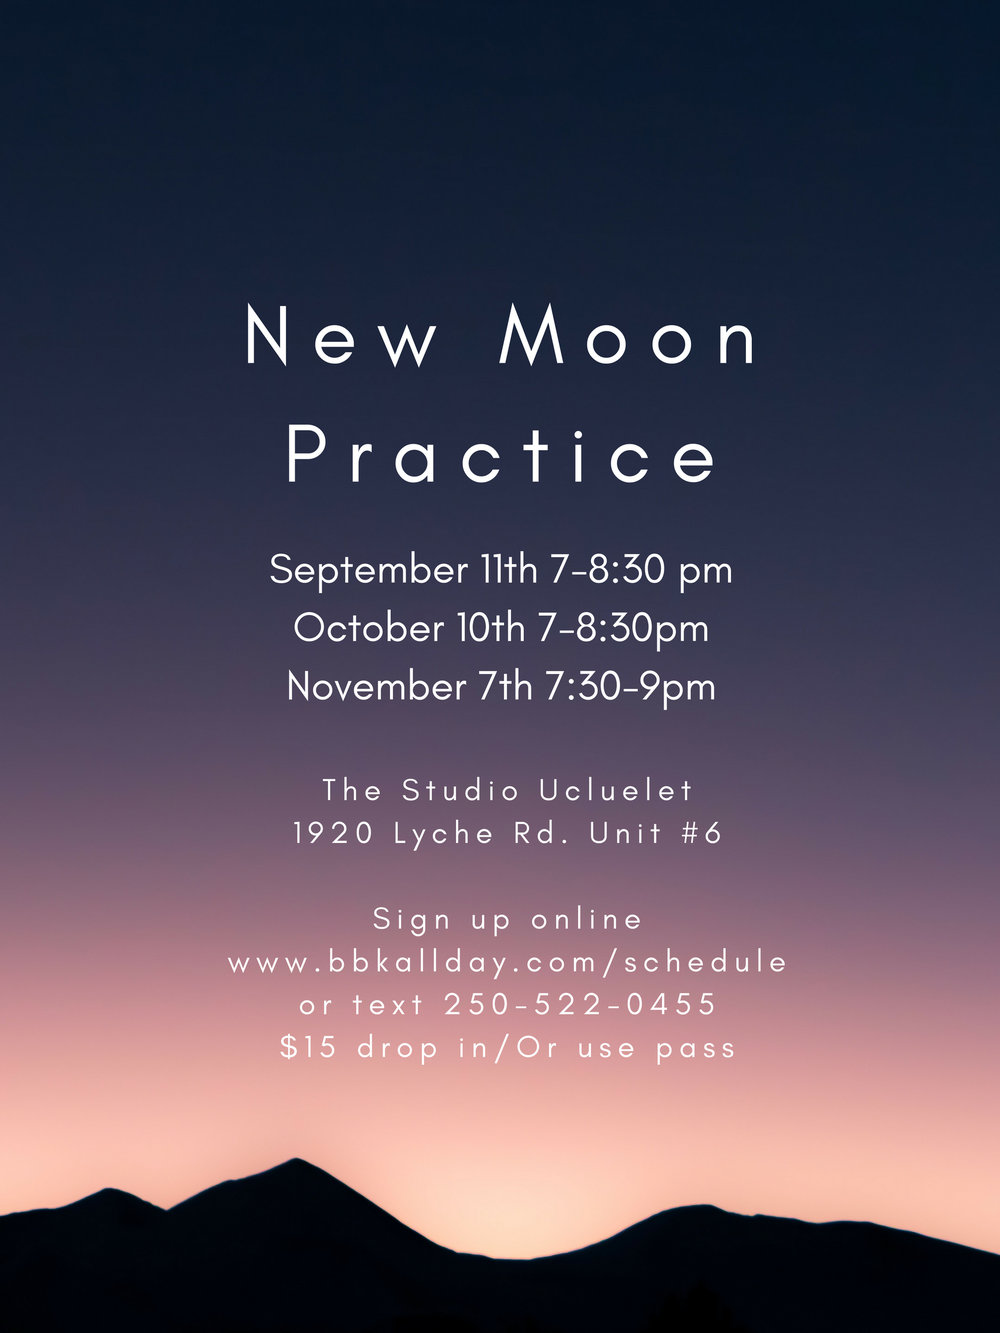 New Moon Practice.jpg